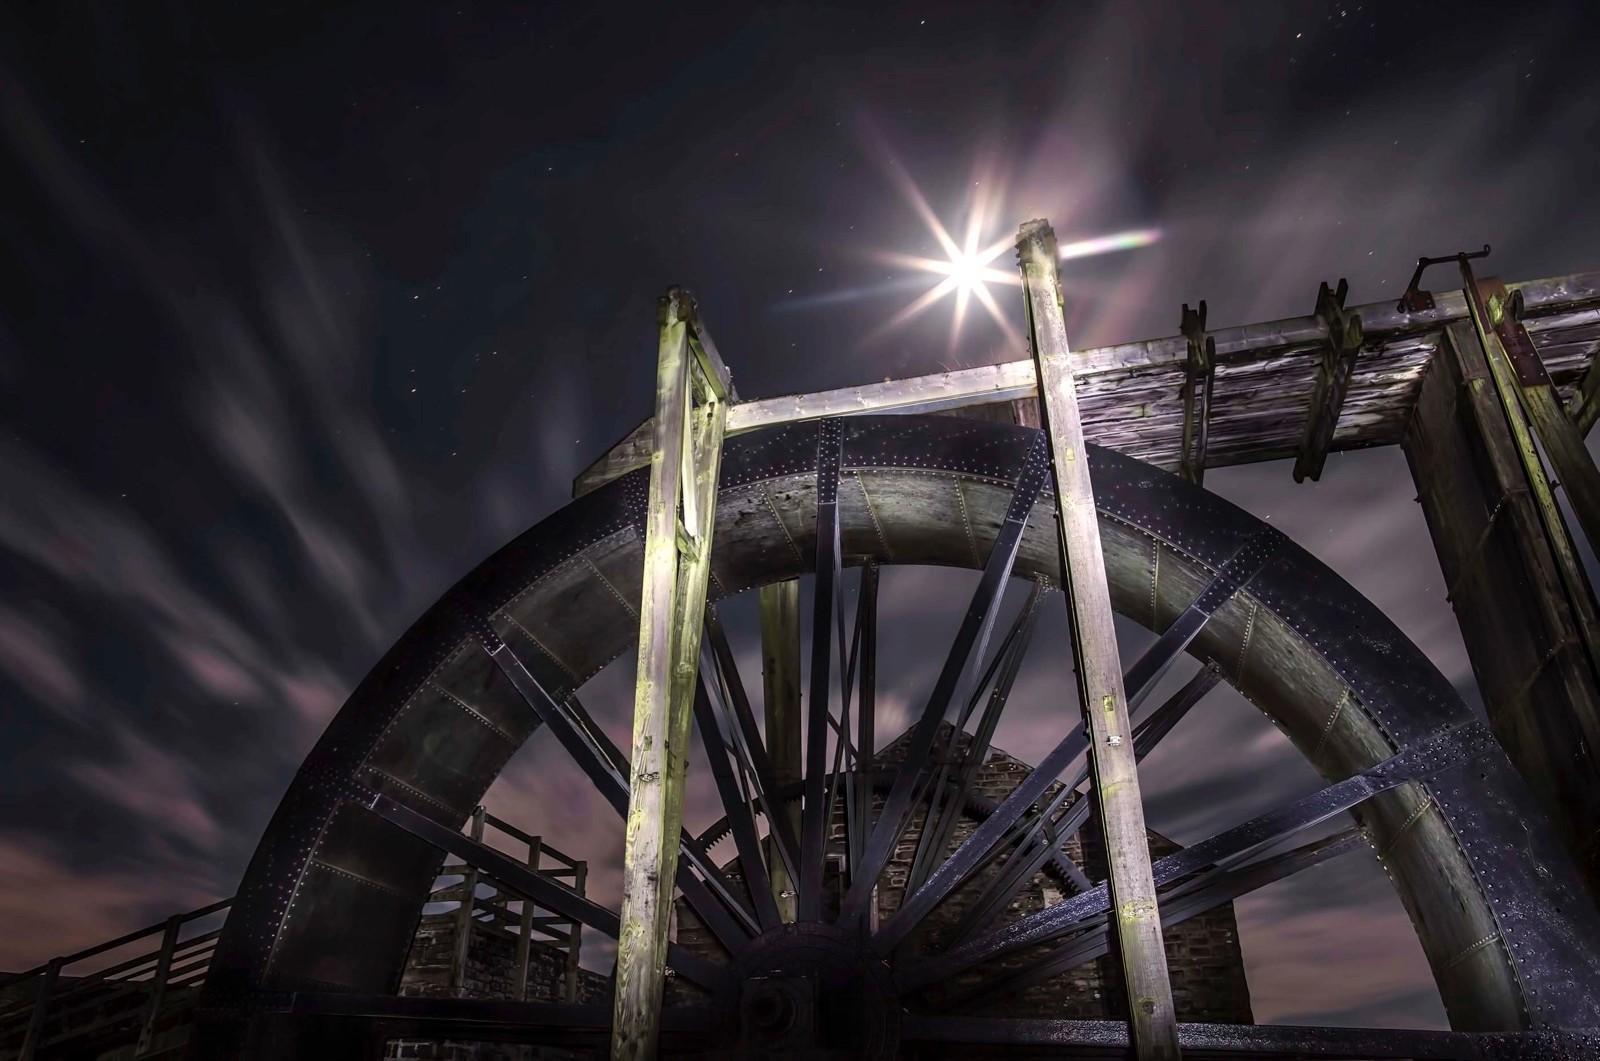 Skywatch-@-Killhope-Museum-Image-by-Gary-Lintern-456ed3a